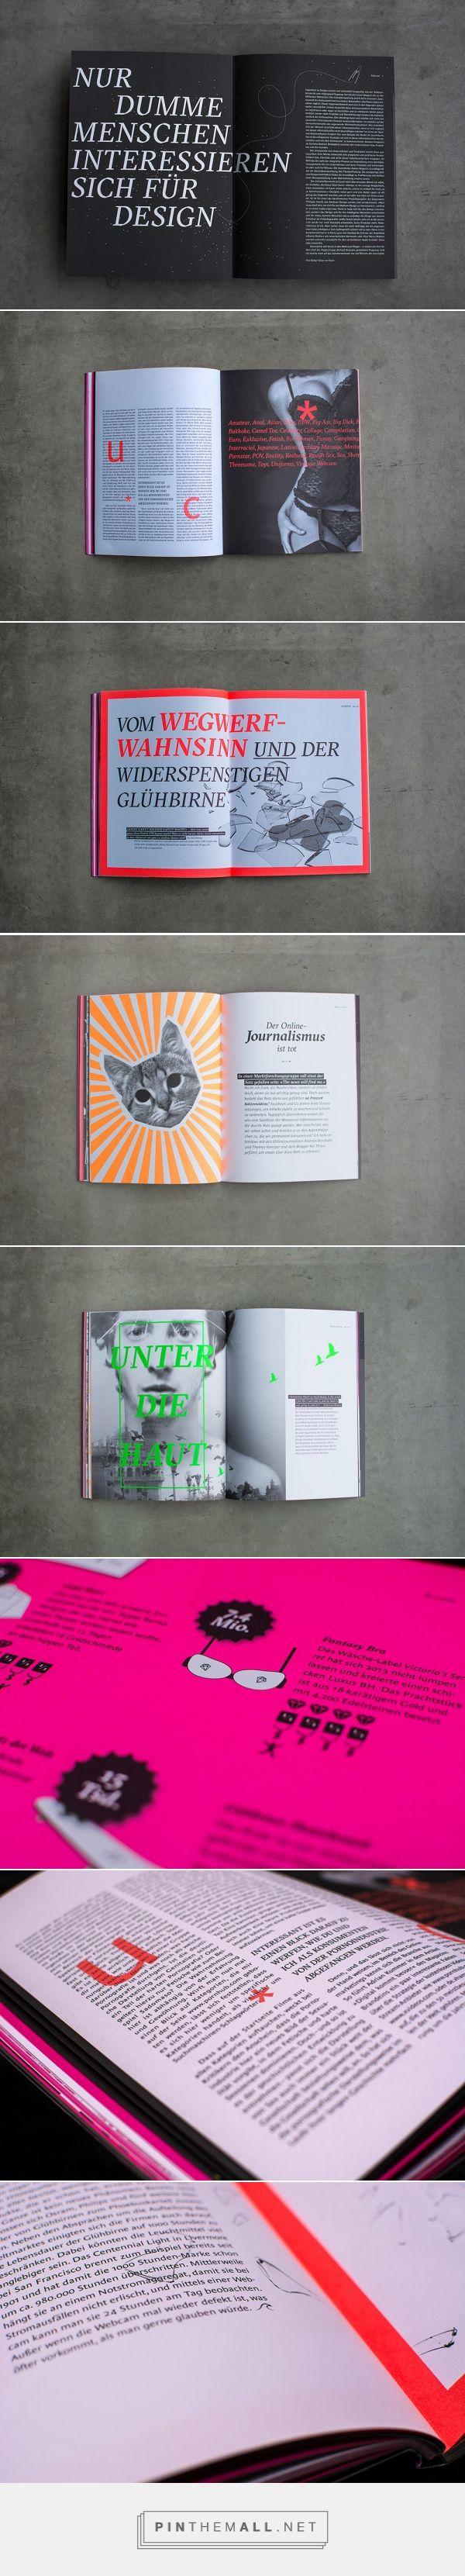 351 Best Gstampa Editorial Images On Pinterest Behance Behavior Piping Layout Books Rhizom 19 Berflut